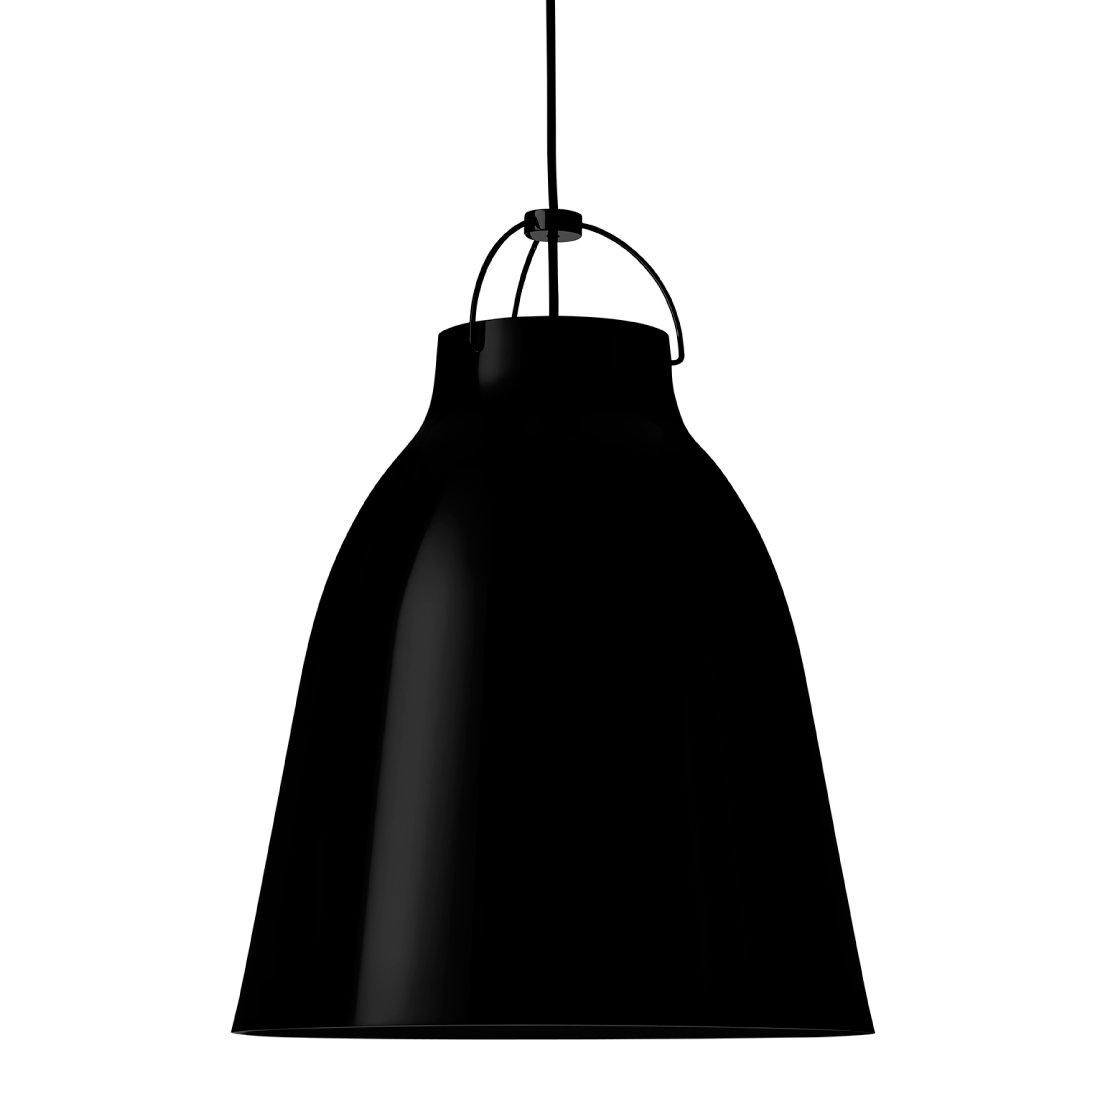 Lightyears Caravaggio P3 Hoogglans Zwart - Zwart - Snoer 600 cm